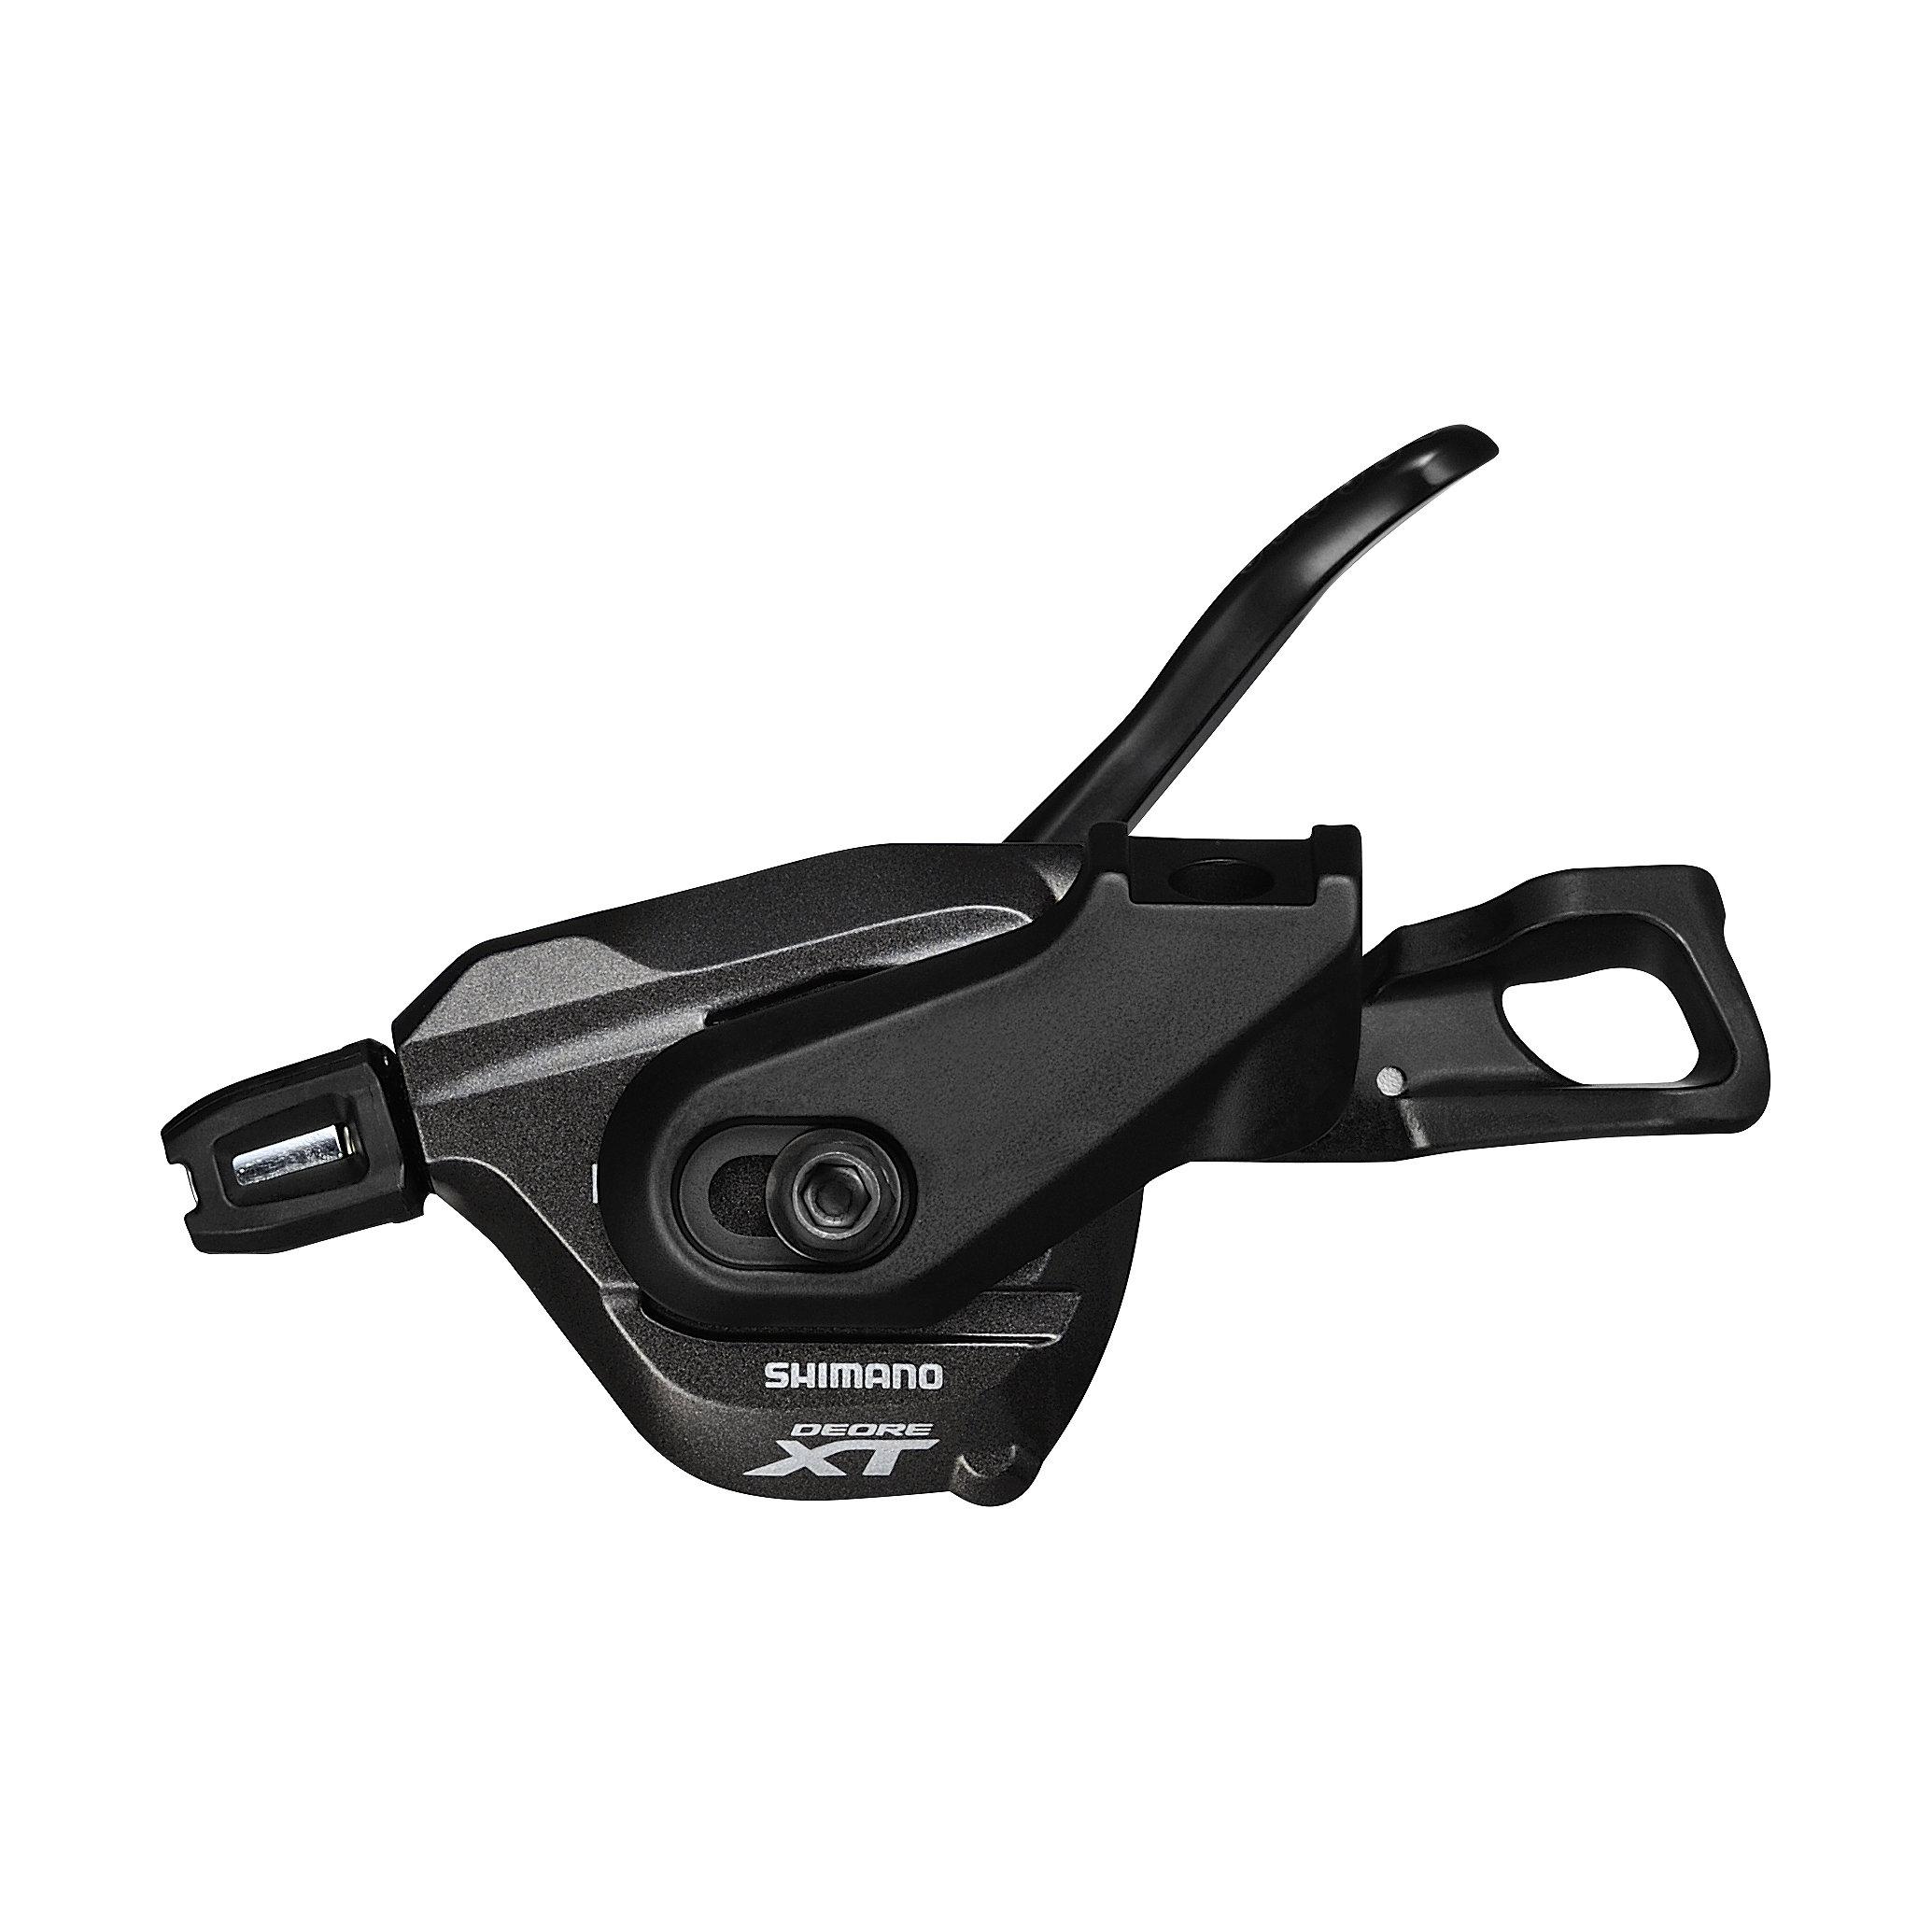 0841a152138 Shimano Deore XT M8000 Rapidfire Plus I-spec B Shift Levers - redbike